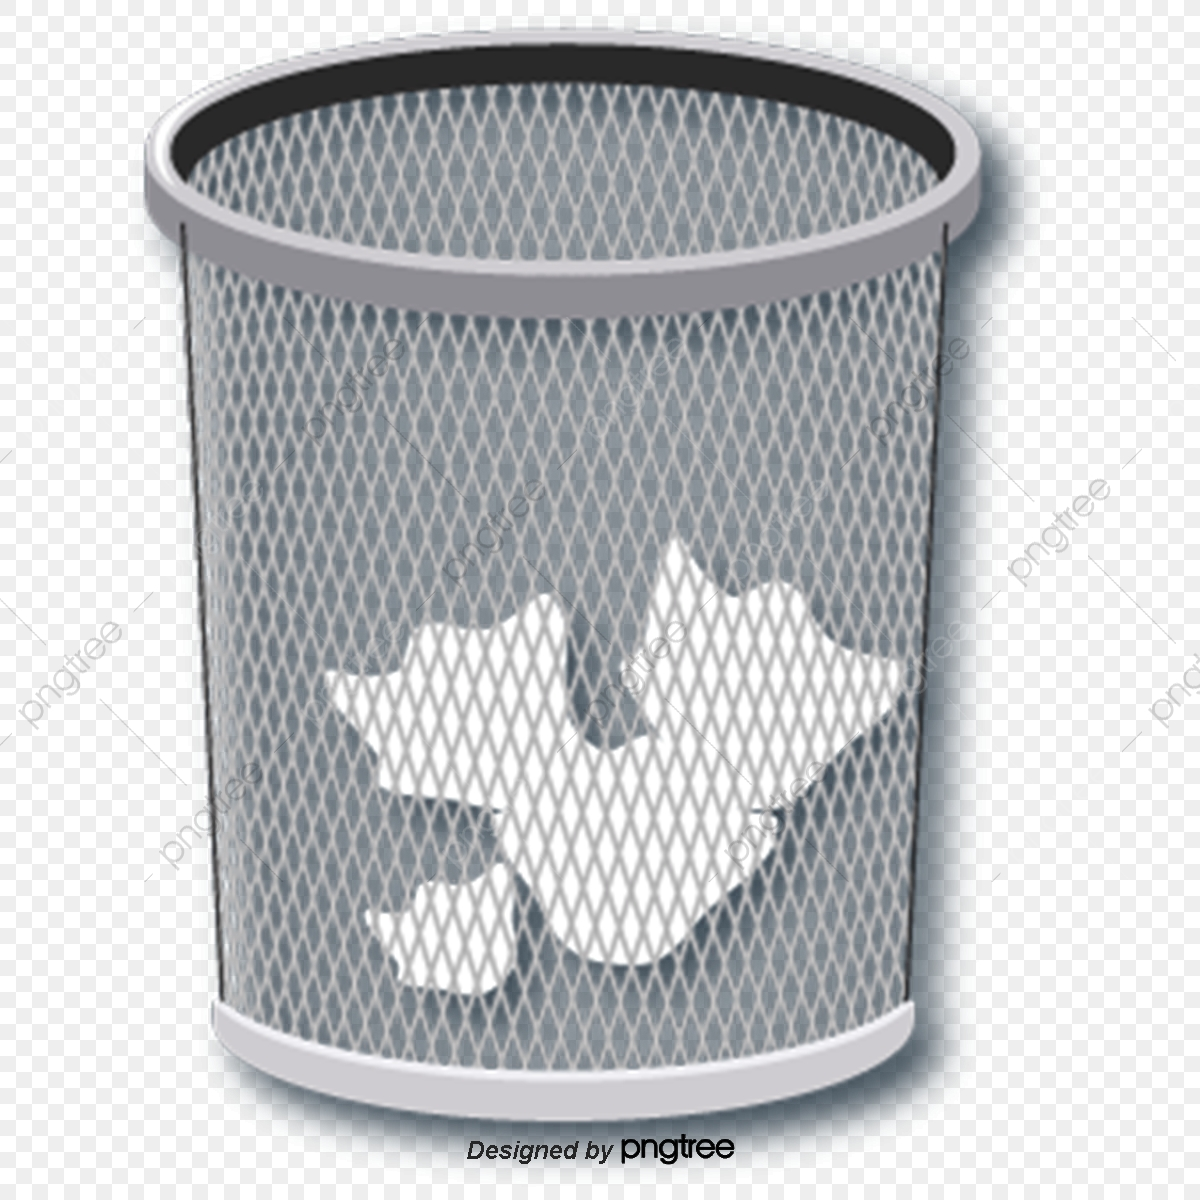 Cartoon Pattern Waste Paper Trash Can, Cartoon Style